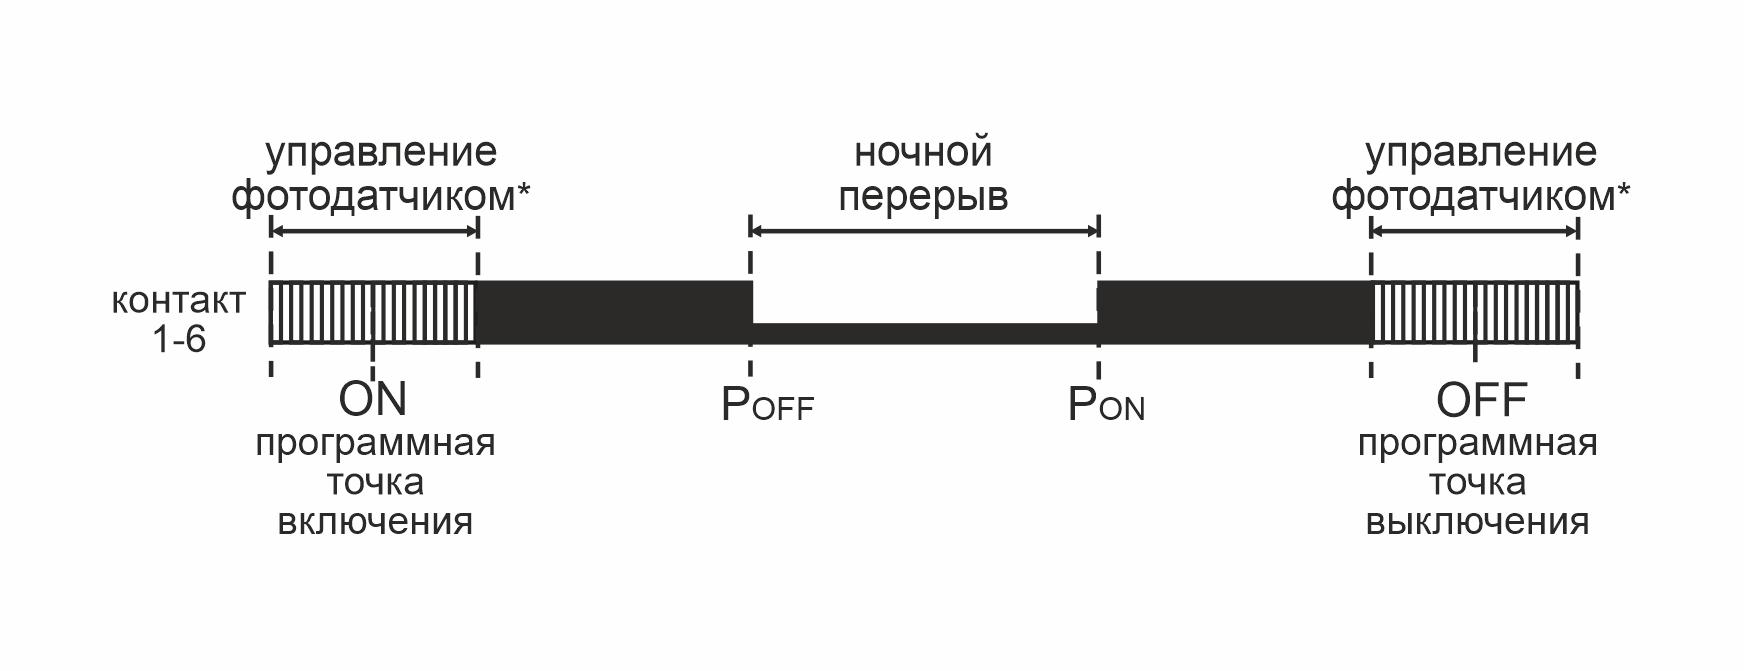 Диаграмма pcz-525-3